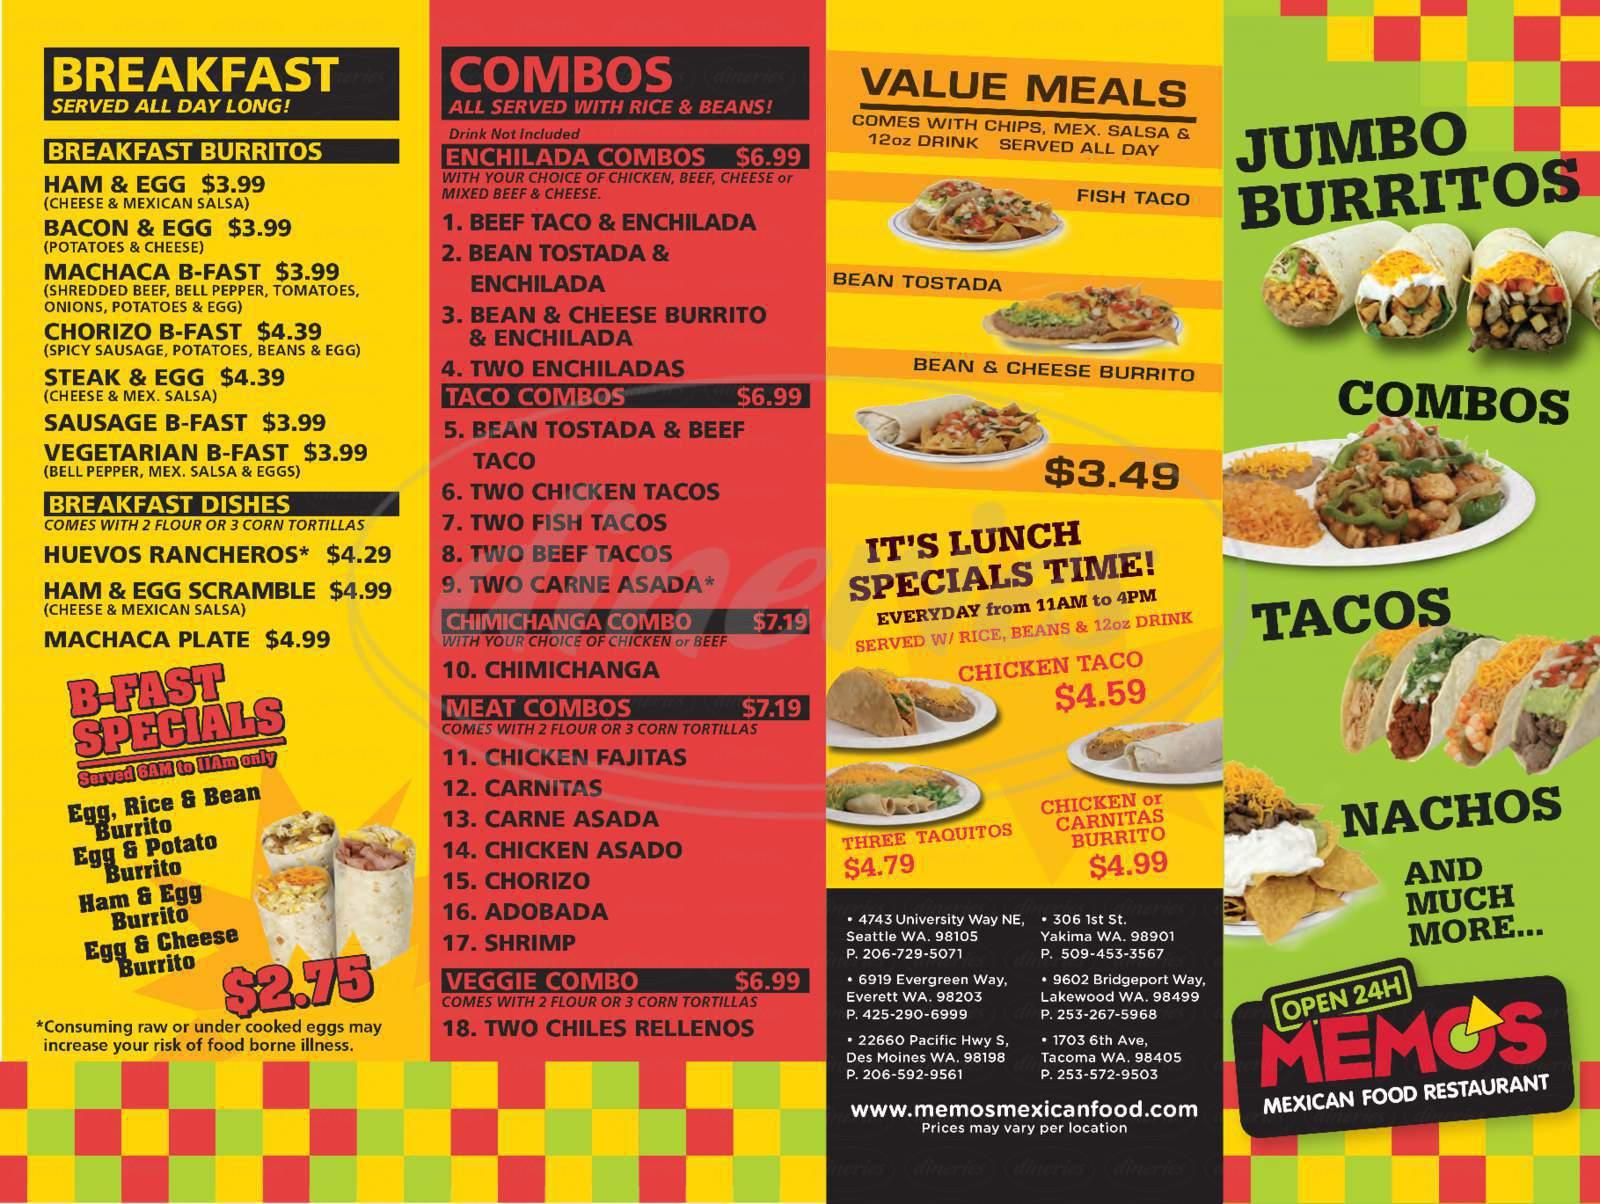 menu for Memo's Mexican Food Restaurant